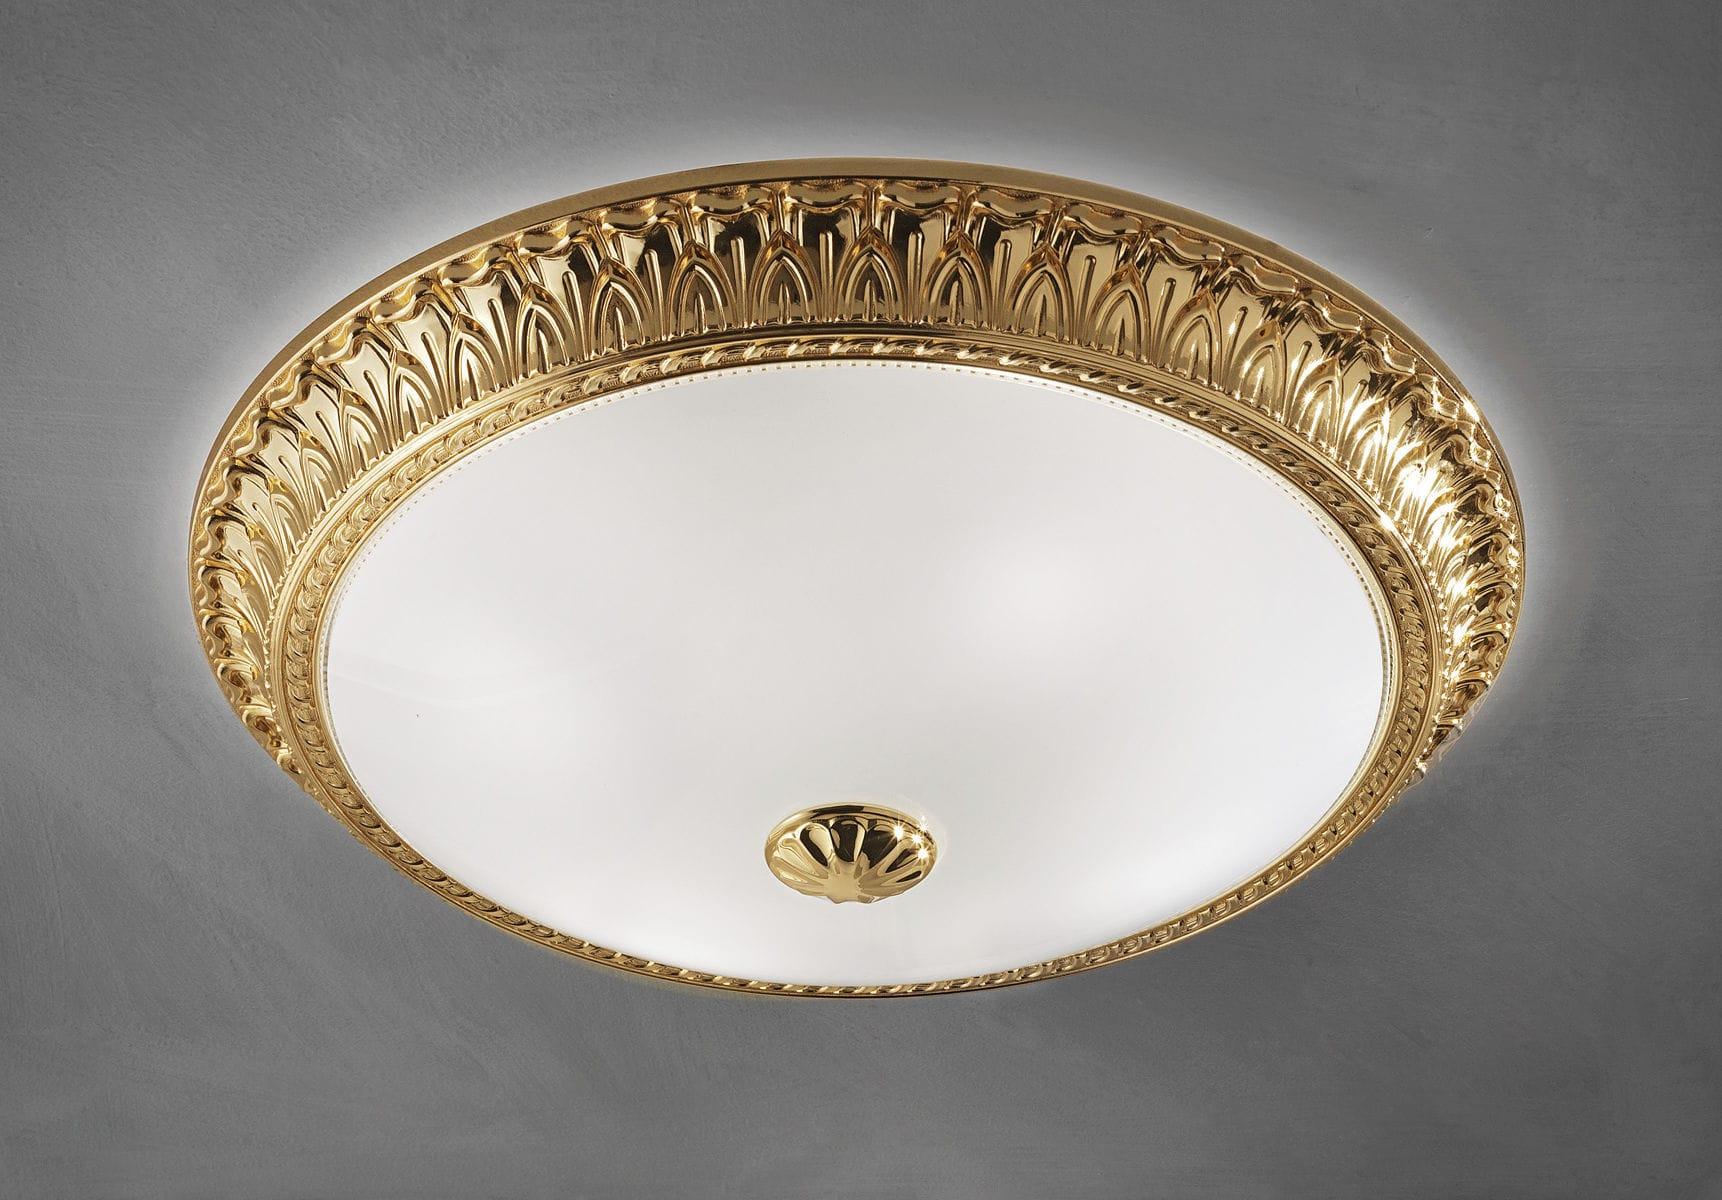 Classic ceiling light round glass incandescent ve 1081 pl3 classic ceiling light round glass incandescent ve 1081 pl3 aloadofball Images